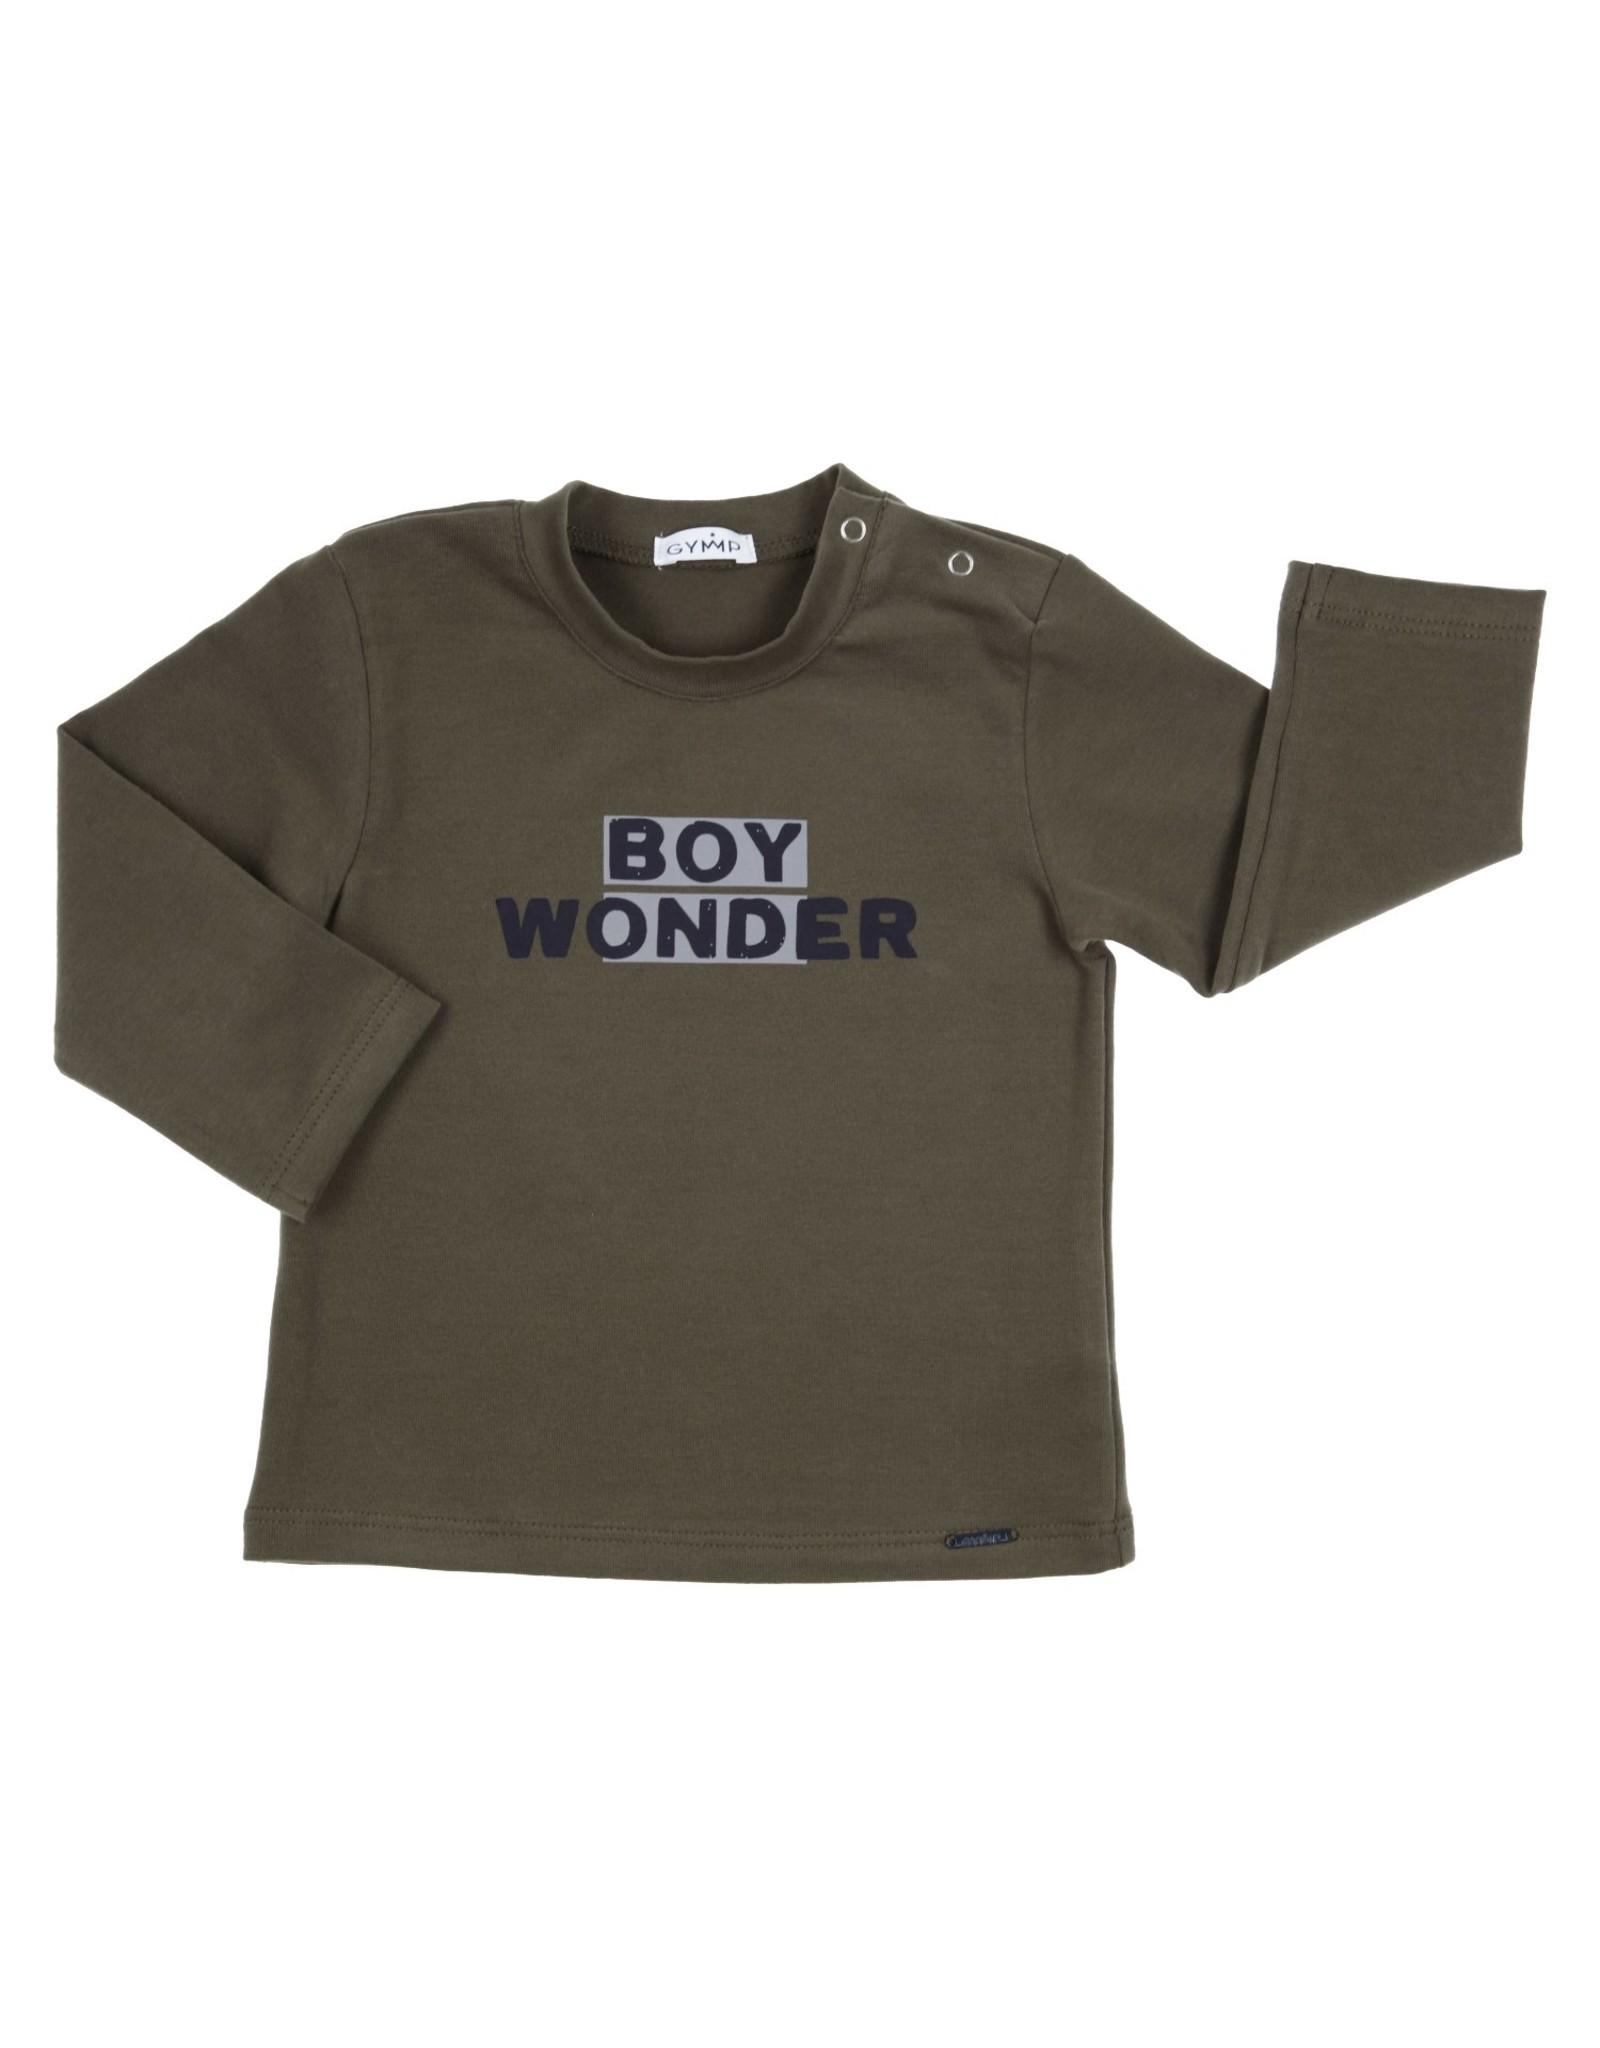 Gymp LONGSLEEVE - BOY WONDER,  KAKI